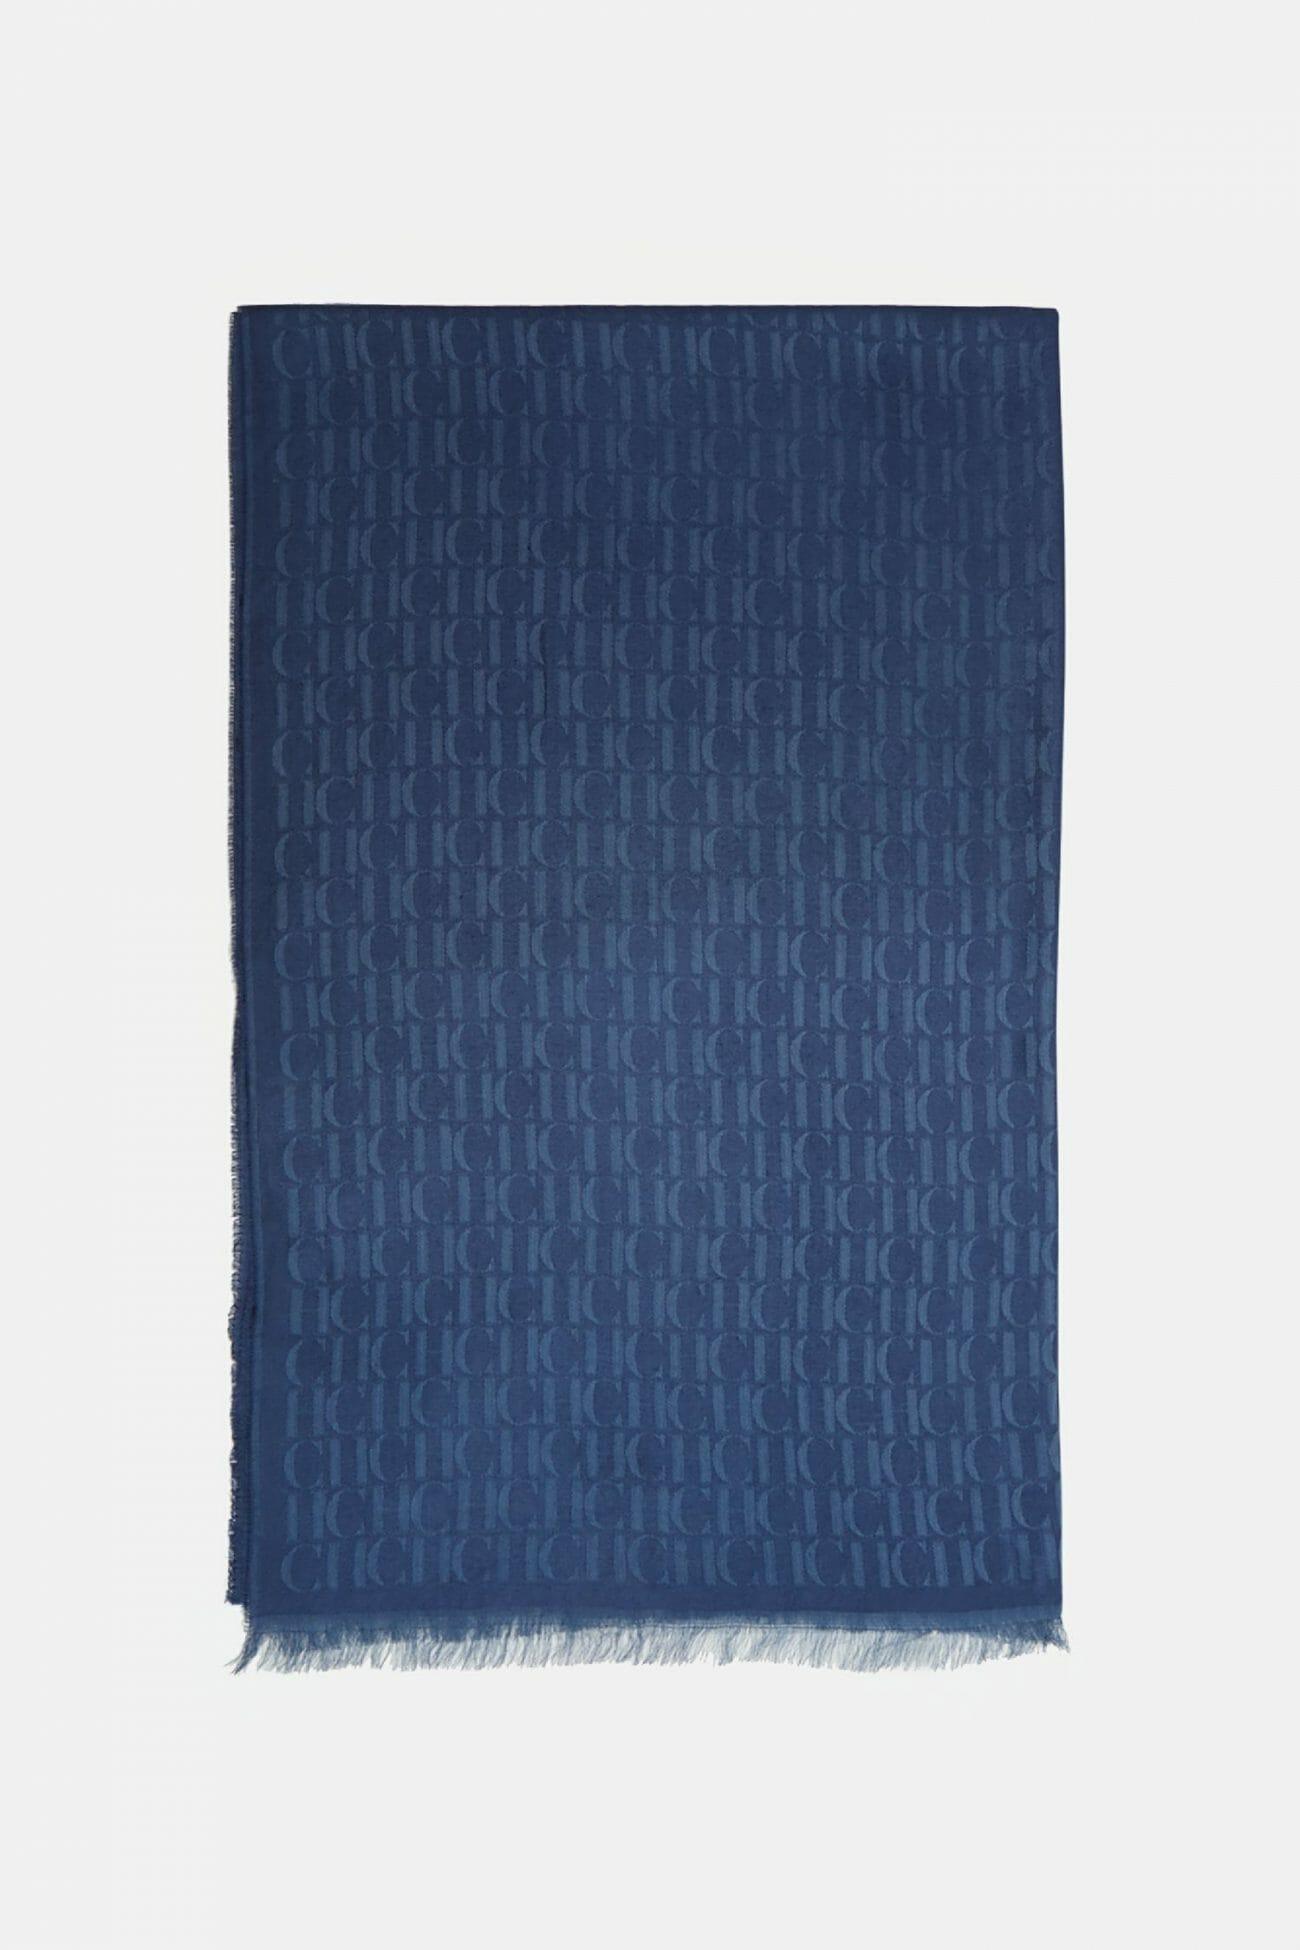 CH-Carolina-herrera-men-accessories-look-42